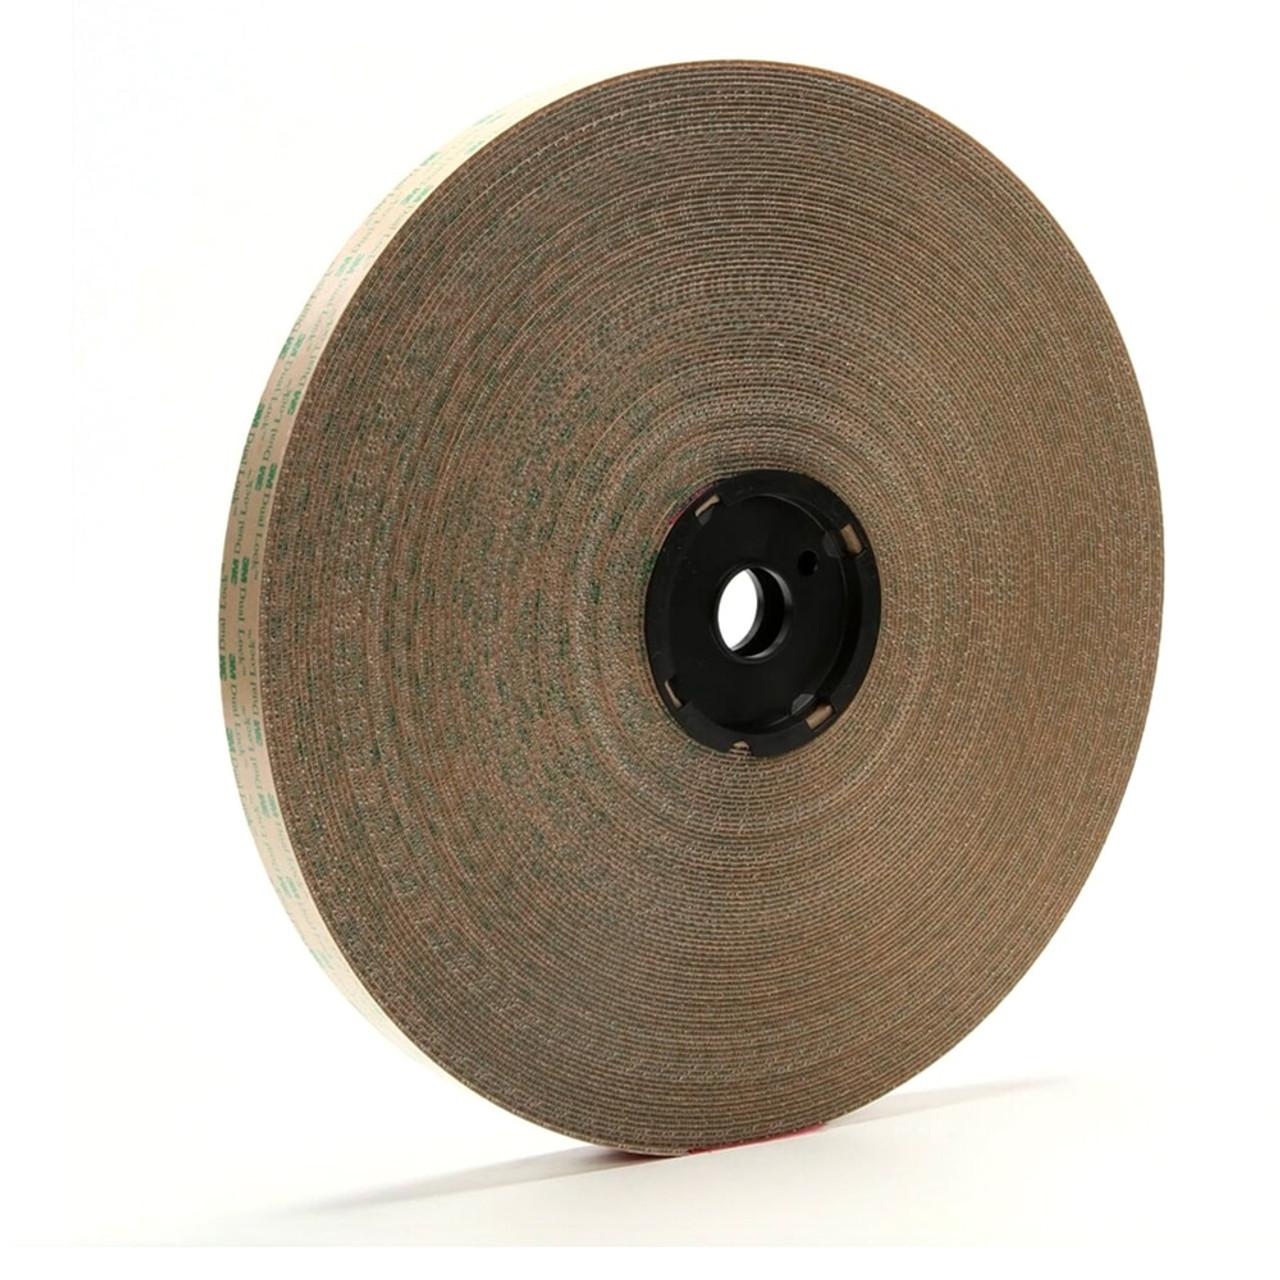 3M™ Dual Lock™ Low Profile Tape Roll - Clear / Dual Lock -  3M Dual Lock